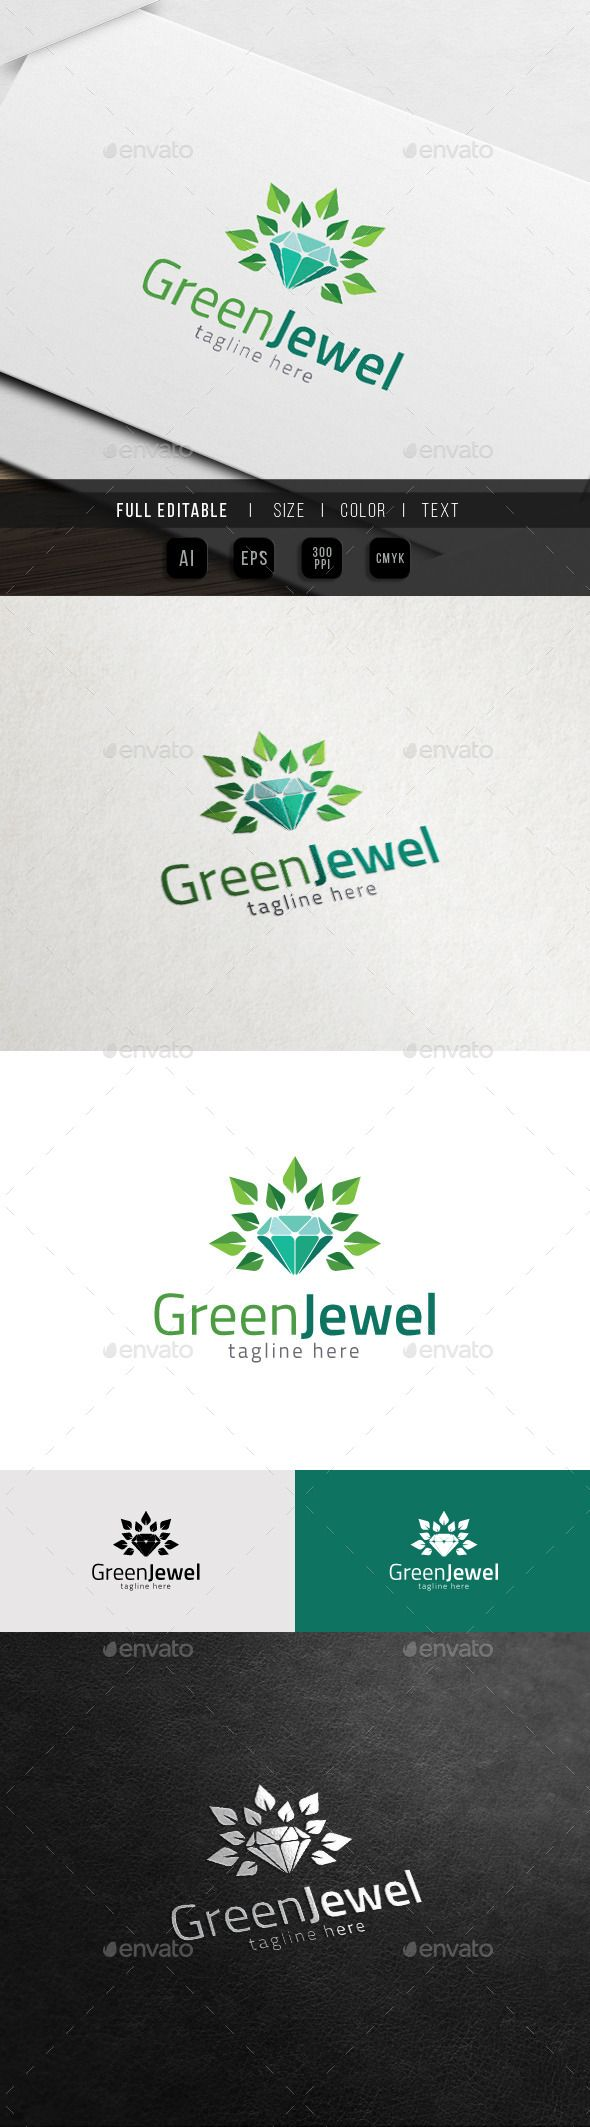 Tj initial luxury ornament monogram logo stock vector - Natural Jewel Green Gem Logo